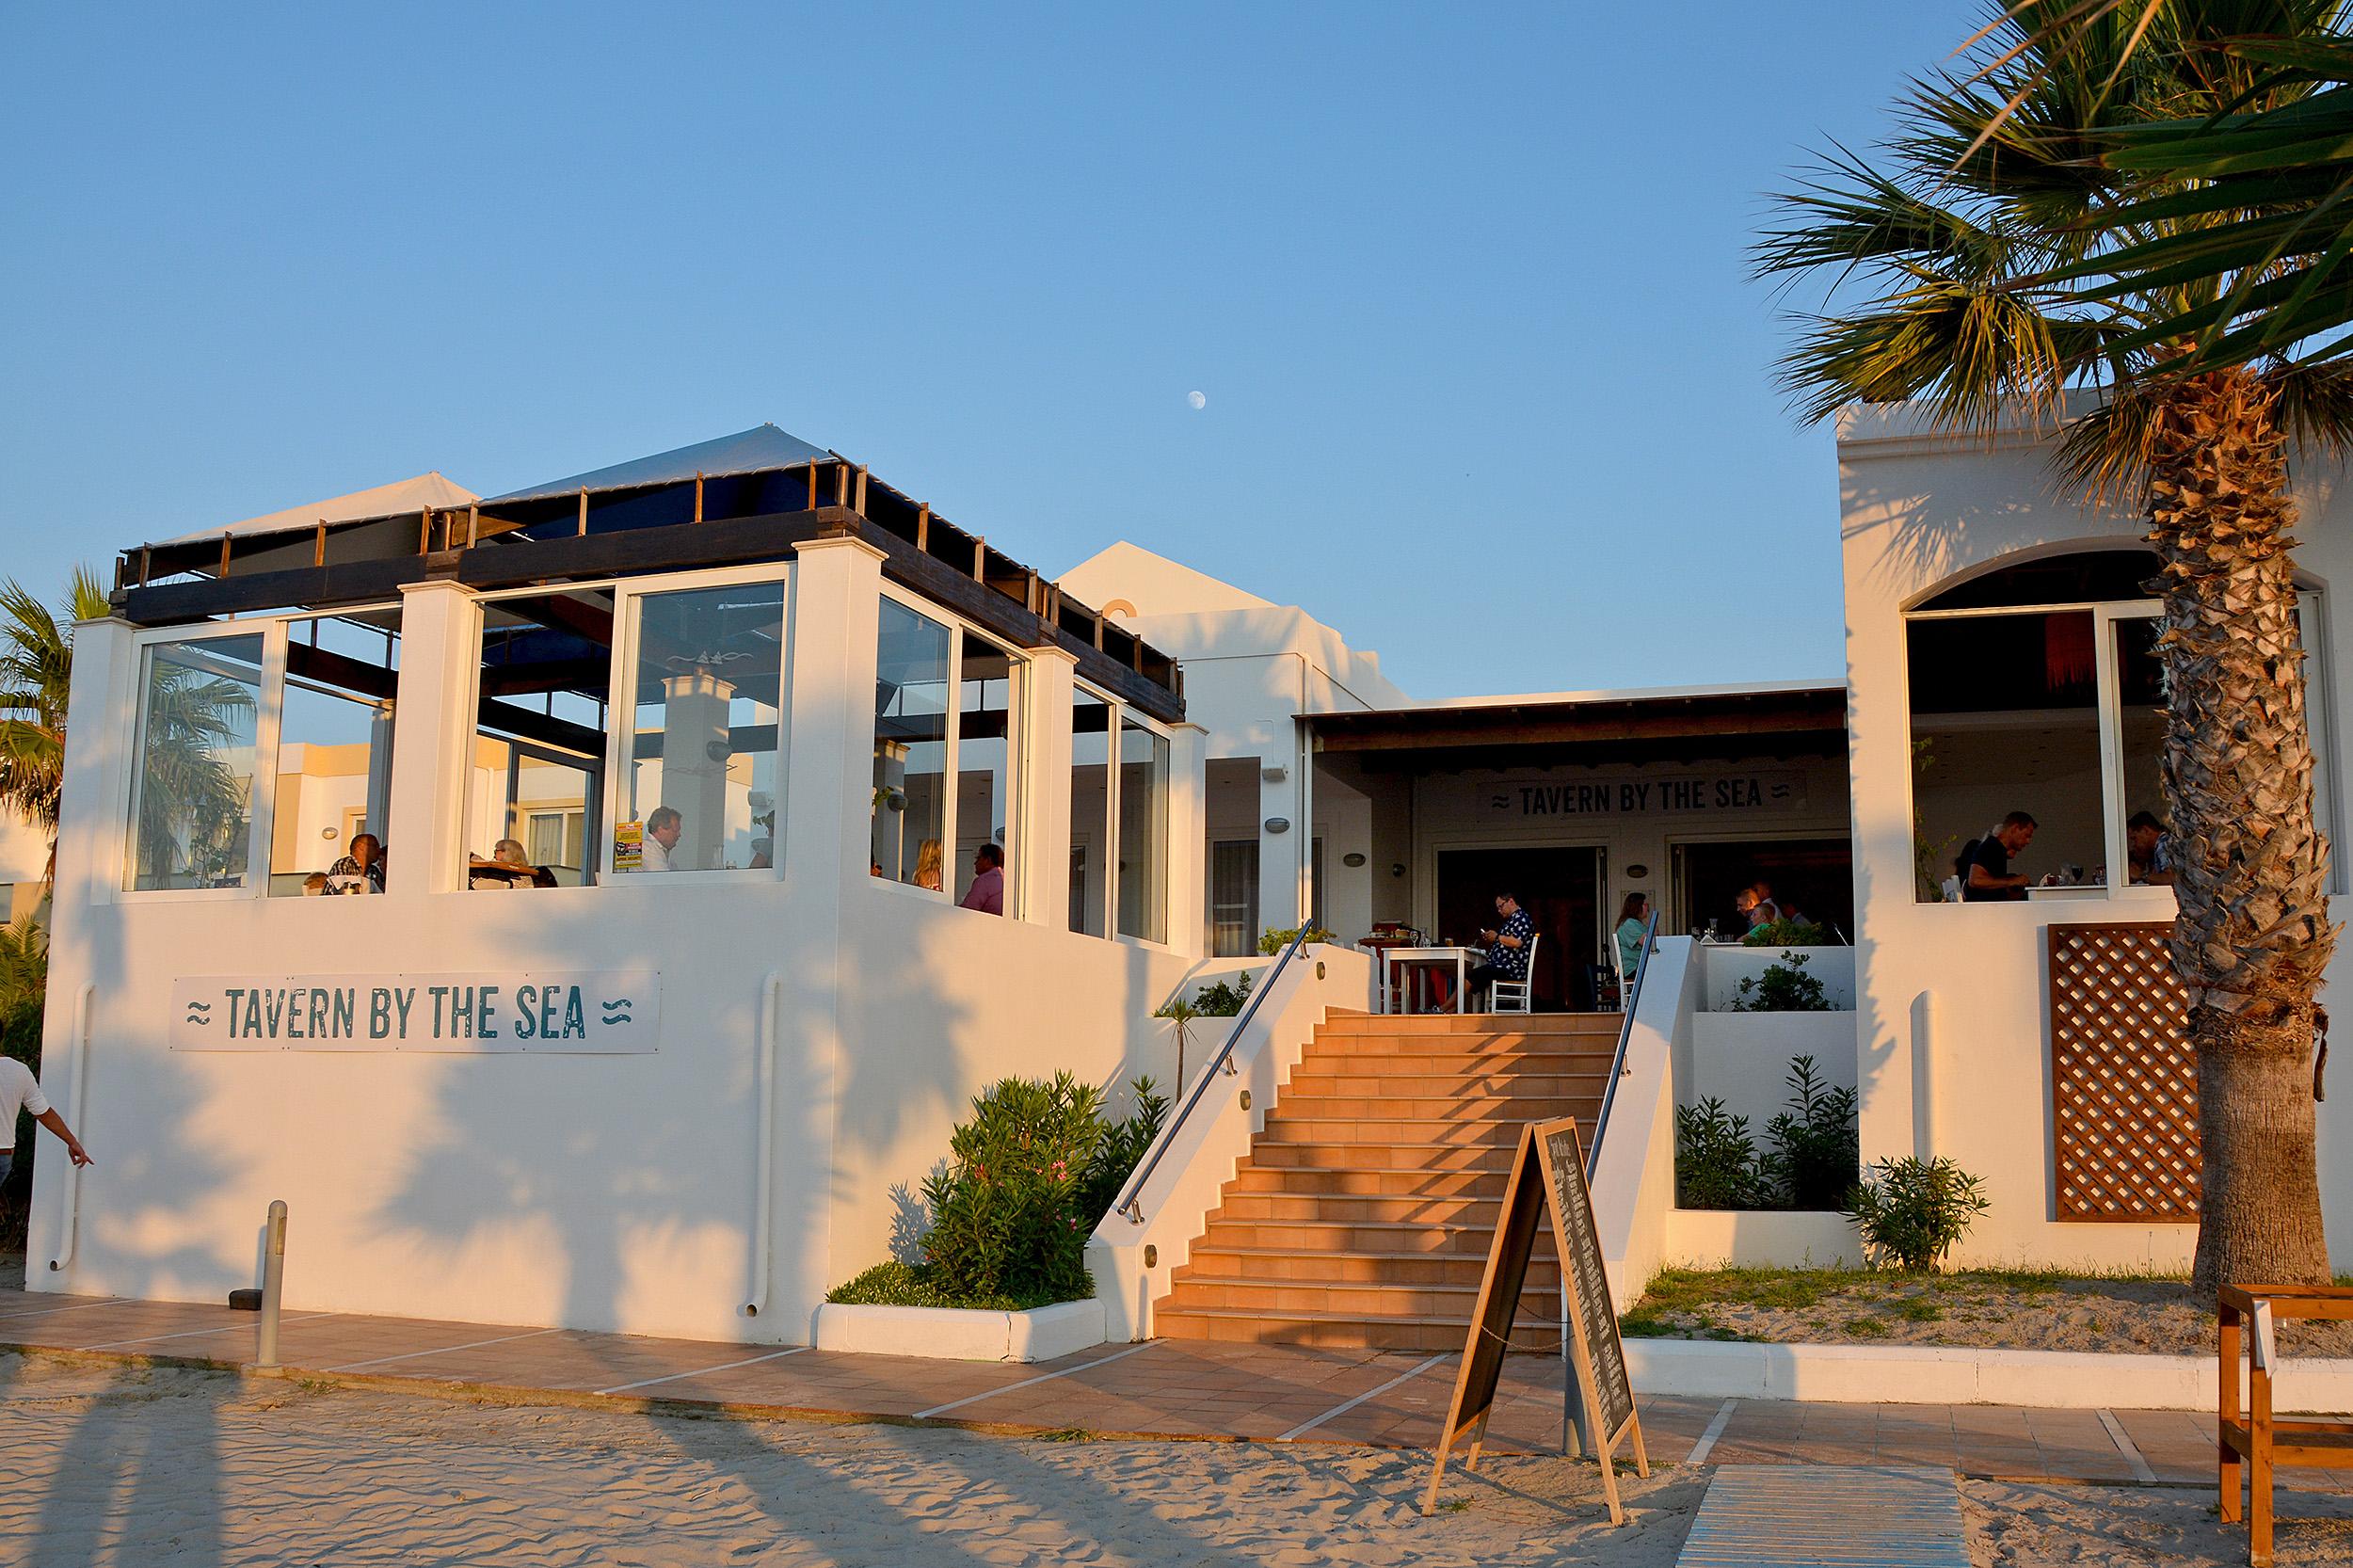 Tavern by the sea kos